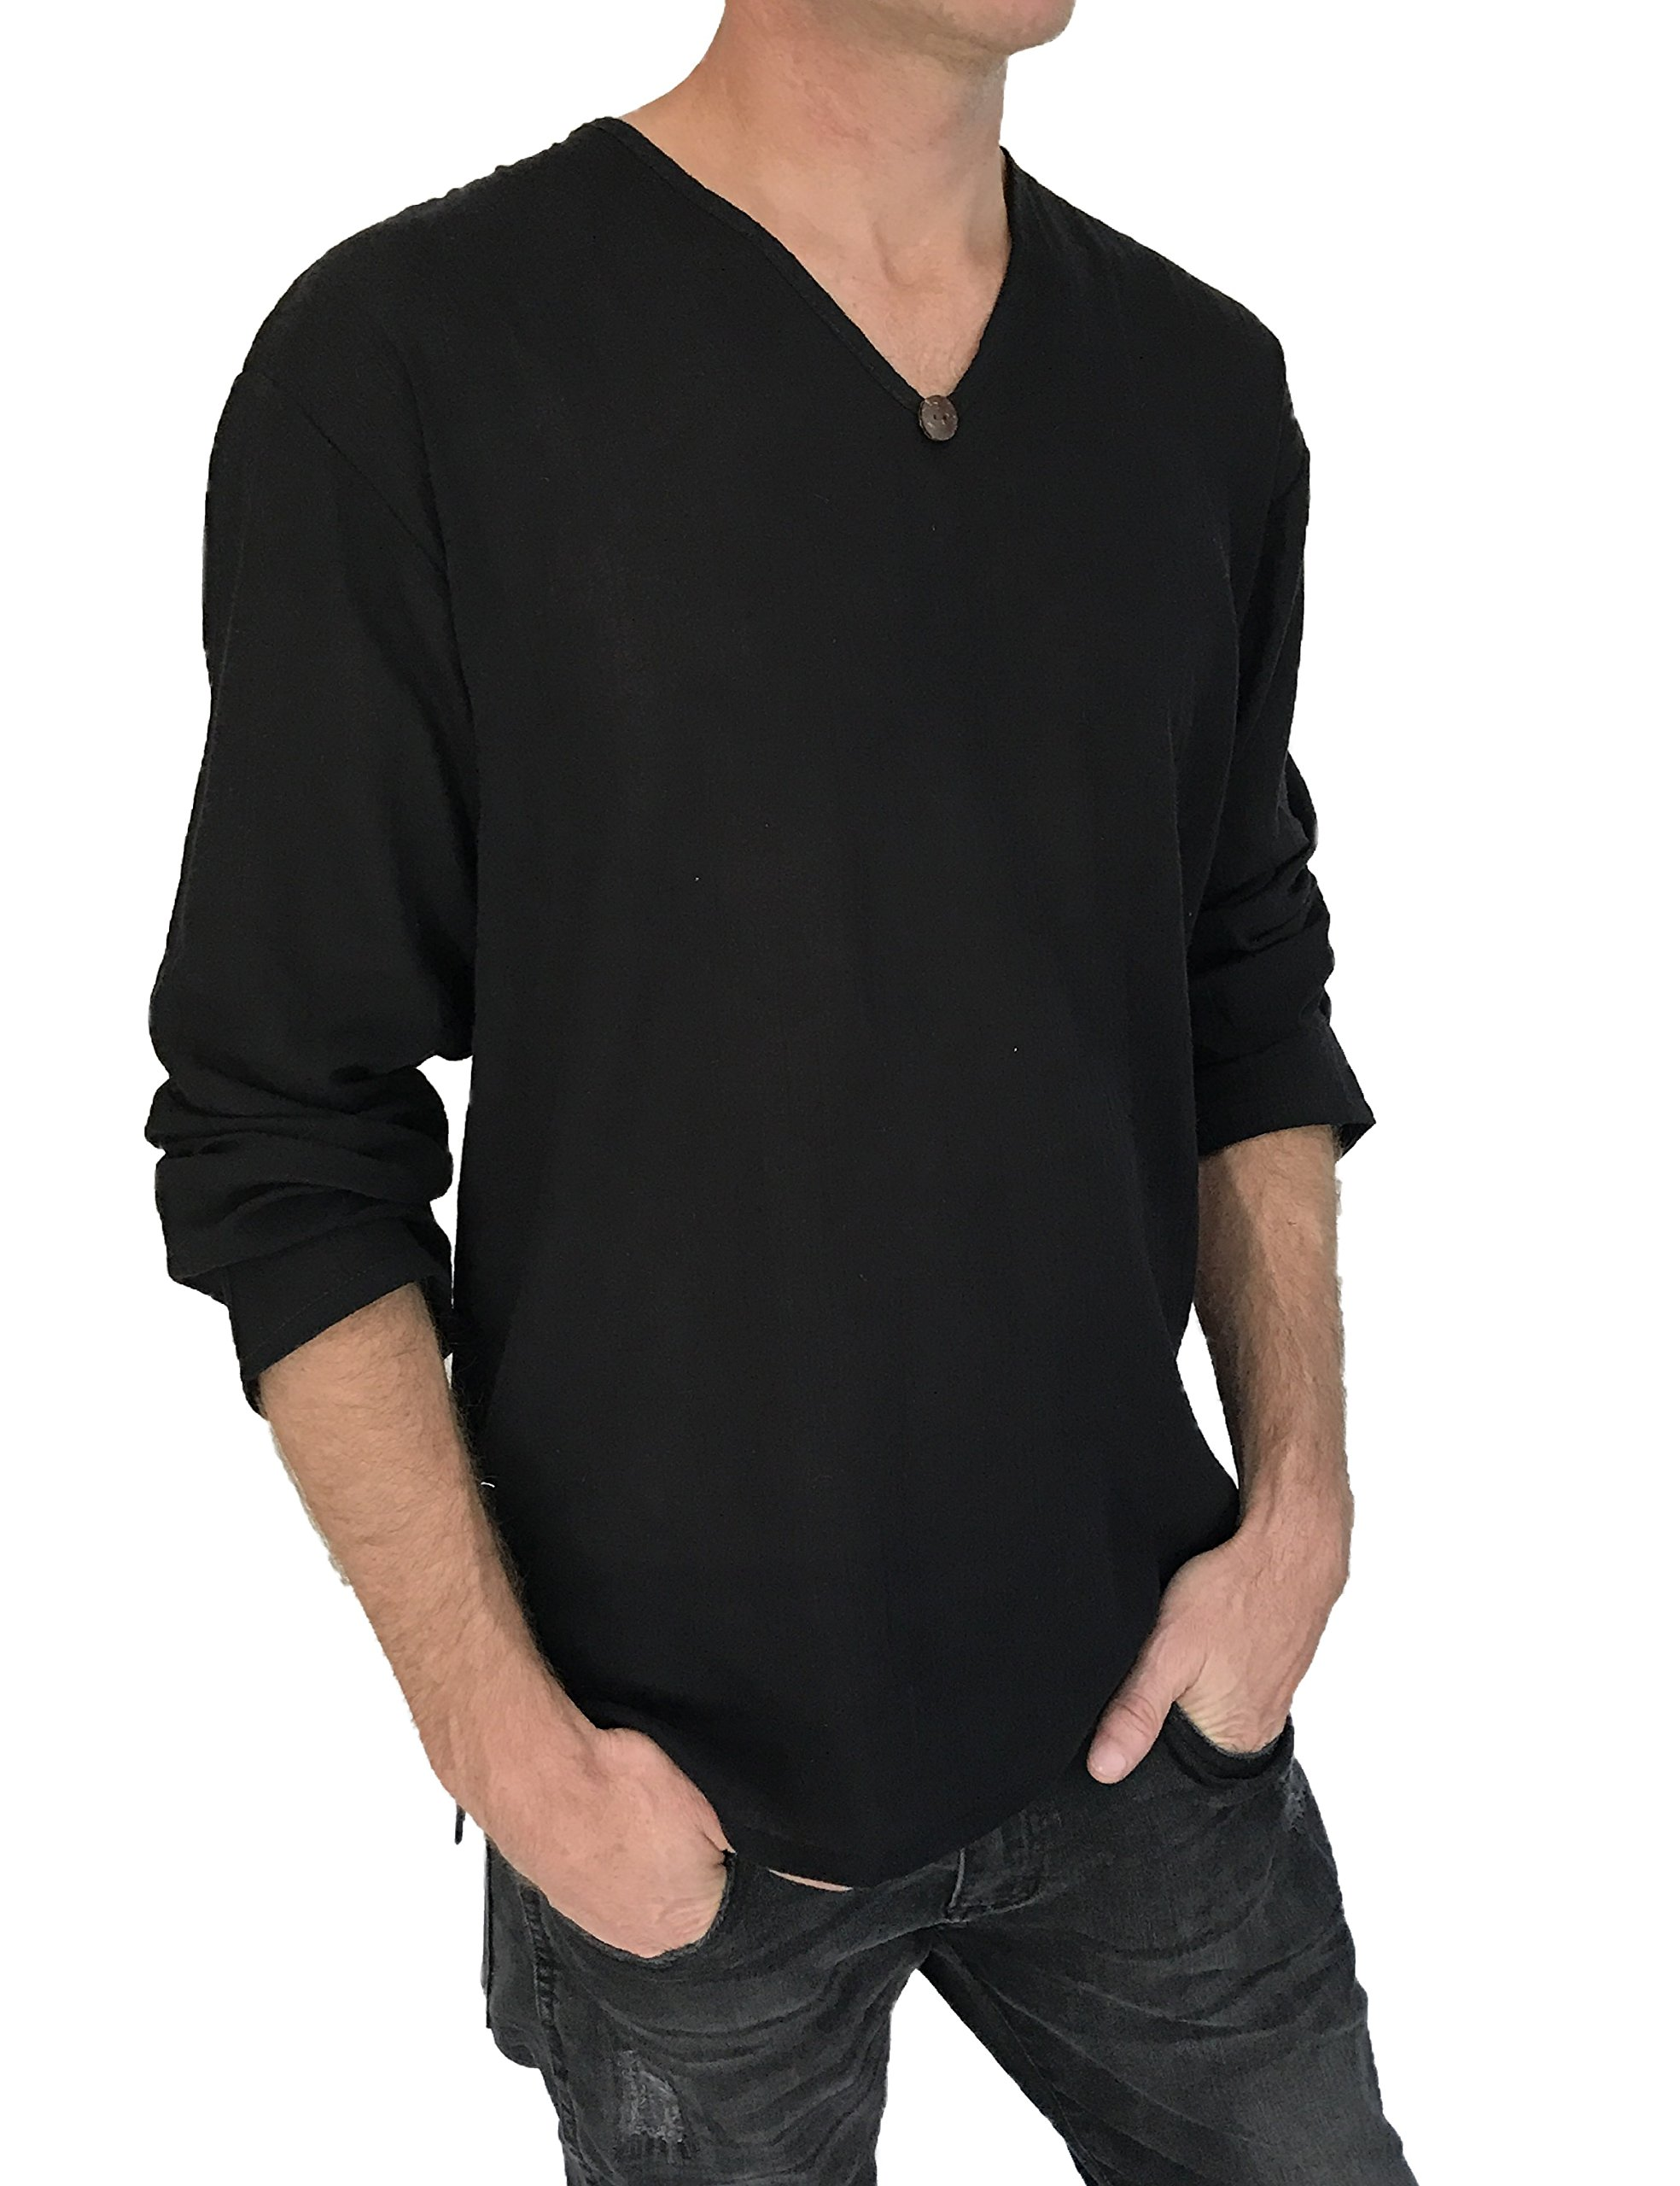 Love Quality Men's T-Shirt 100% Cotton Hippie Shirt Beach Yoga Top Feature Button (Medium, Black) by Love Quality (Image #4)